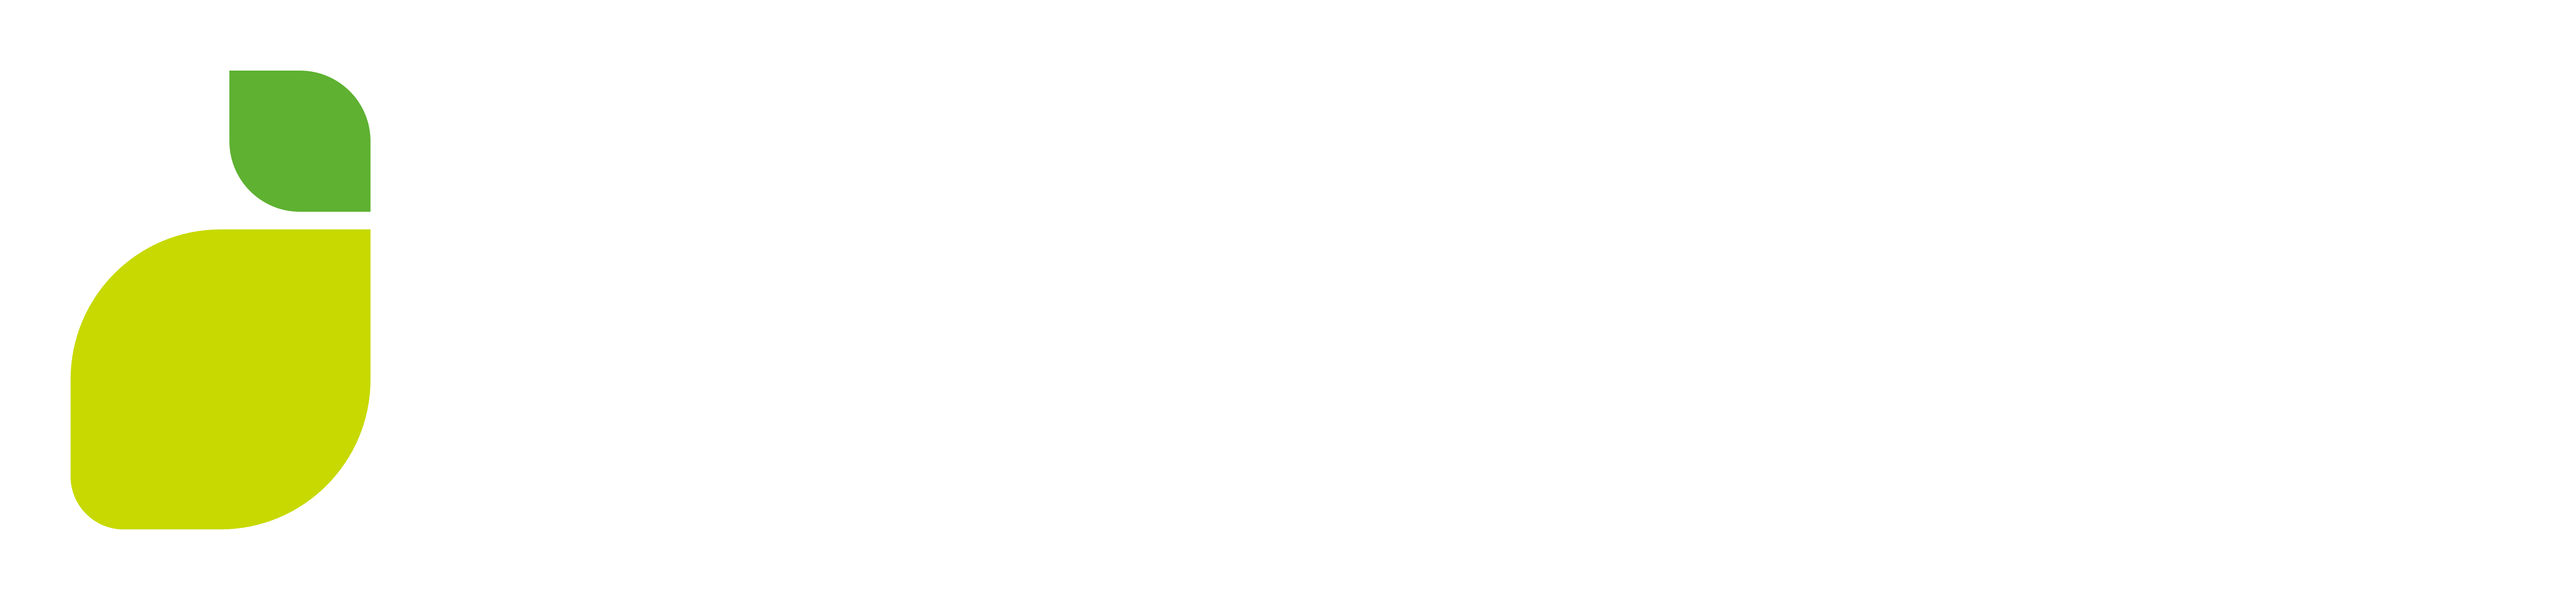 TimeBilling logo